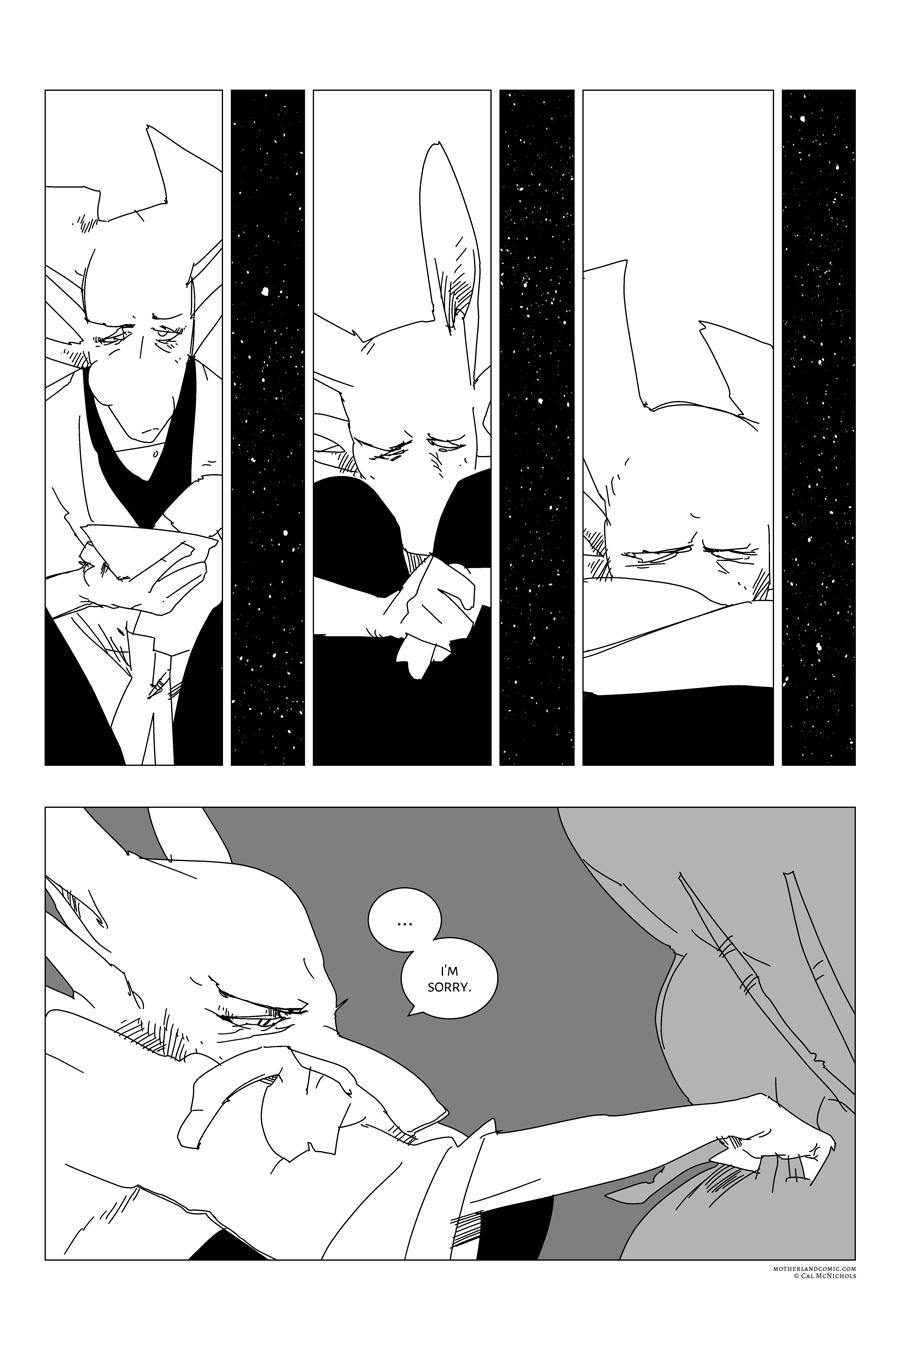 pg 124